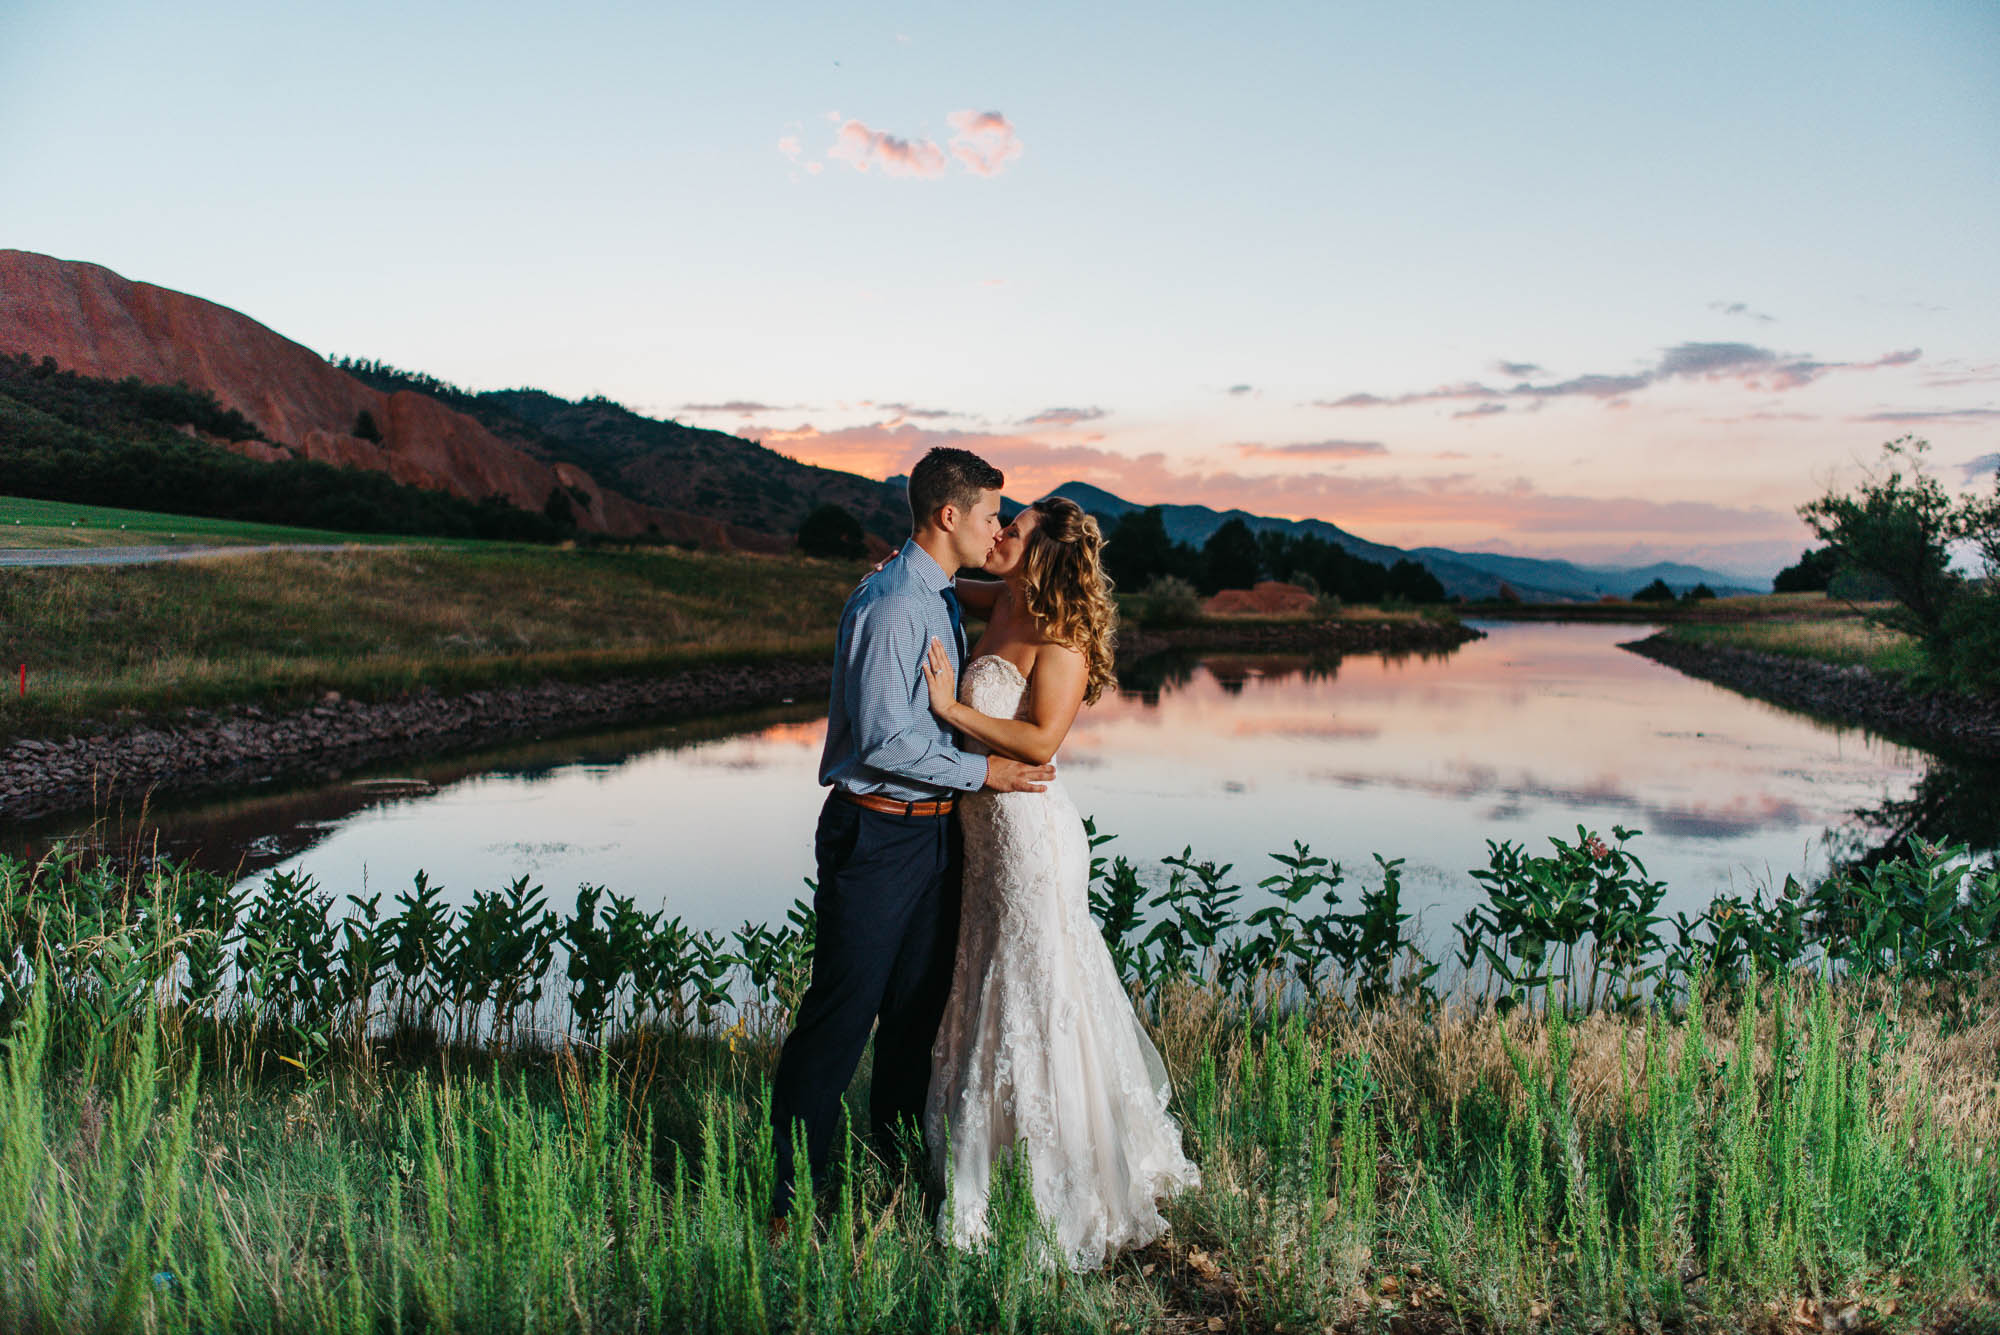 131elopement-photographer-colorado-arrowhead-wedding-jordan&jace-3320.jpg